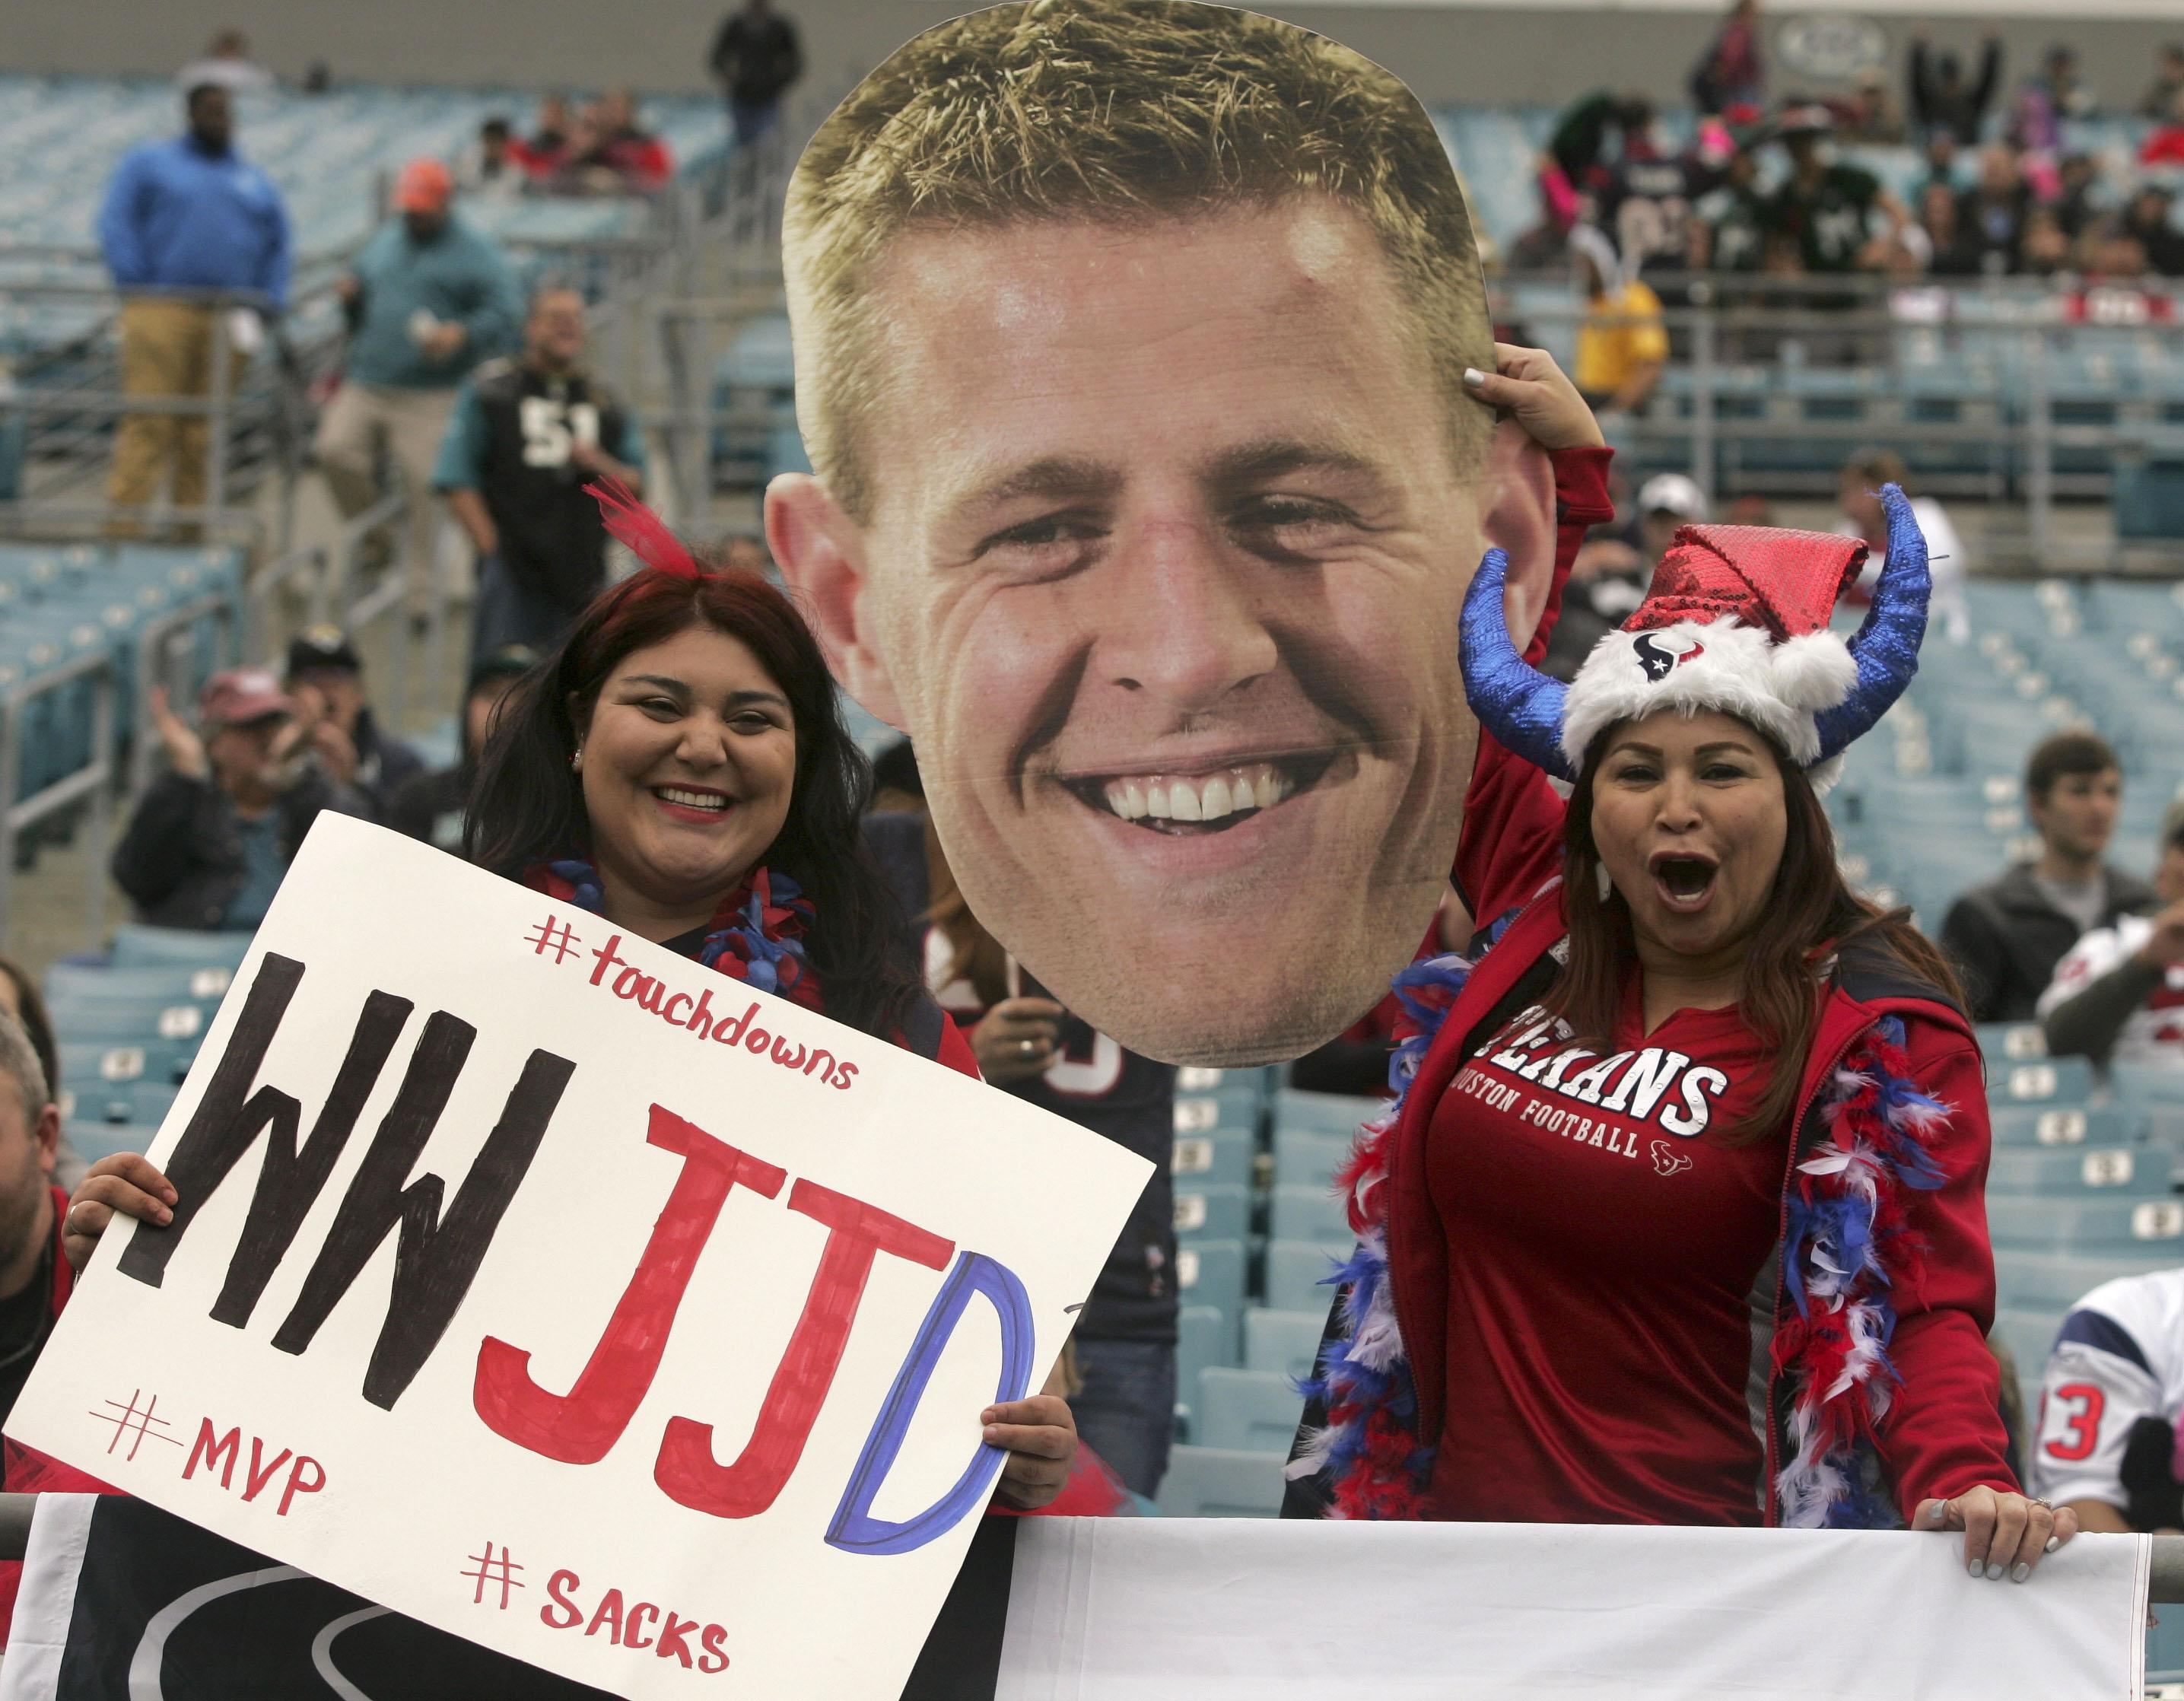 Texans fans are somewhat fond of J.J. Watt.